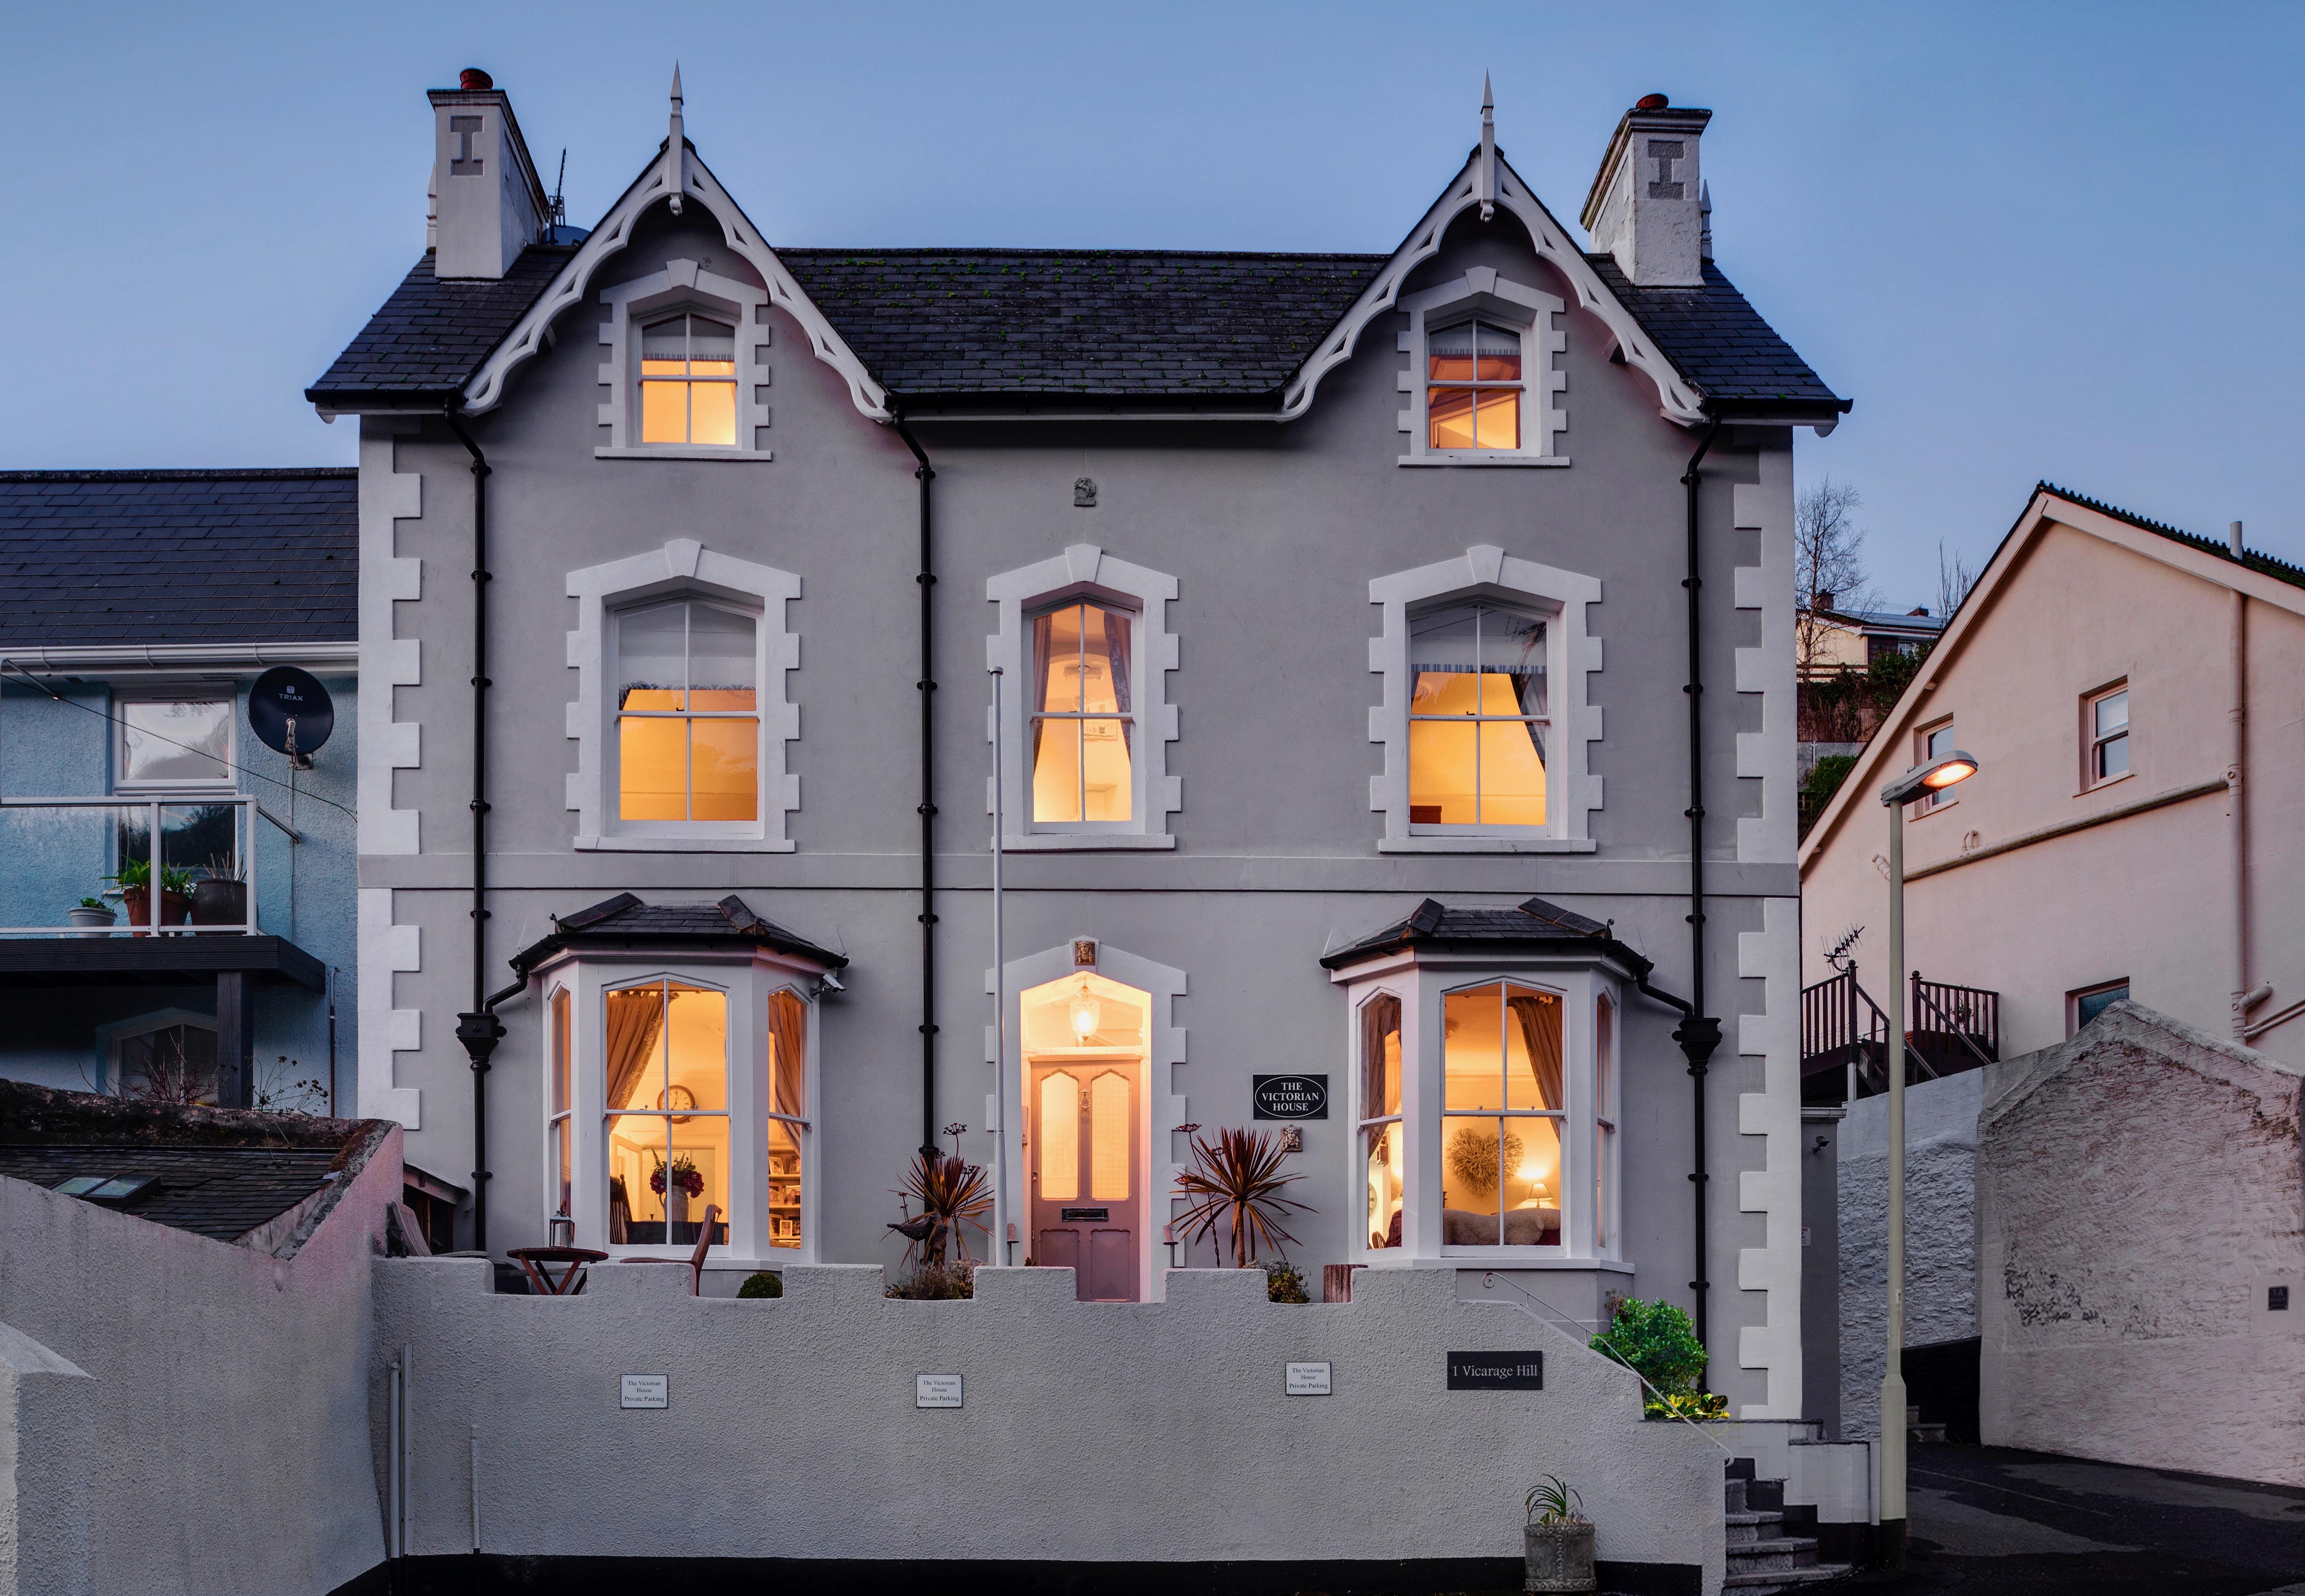 The Victorian House, Dartmouth, Devon